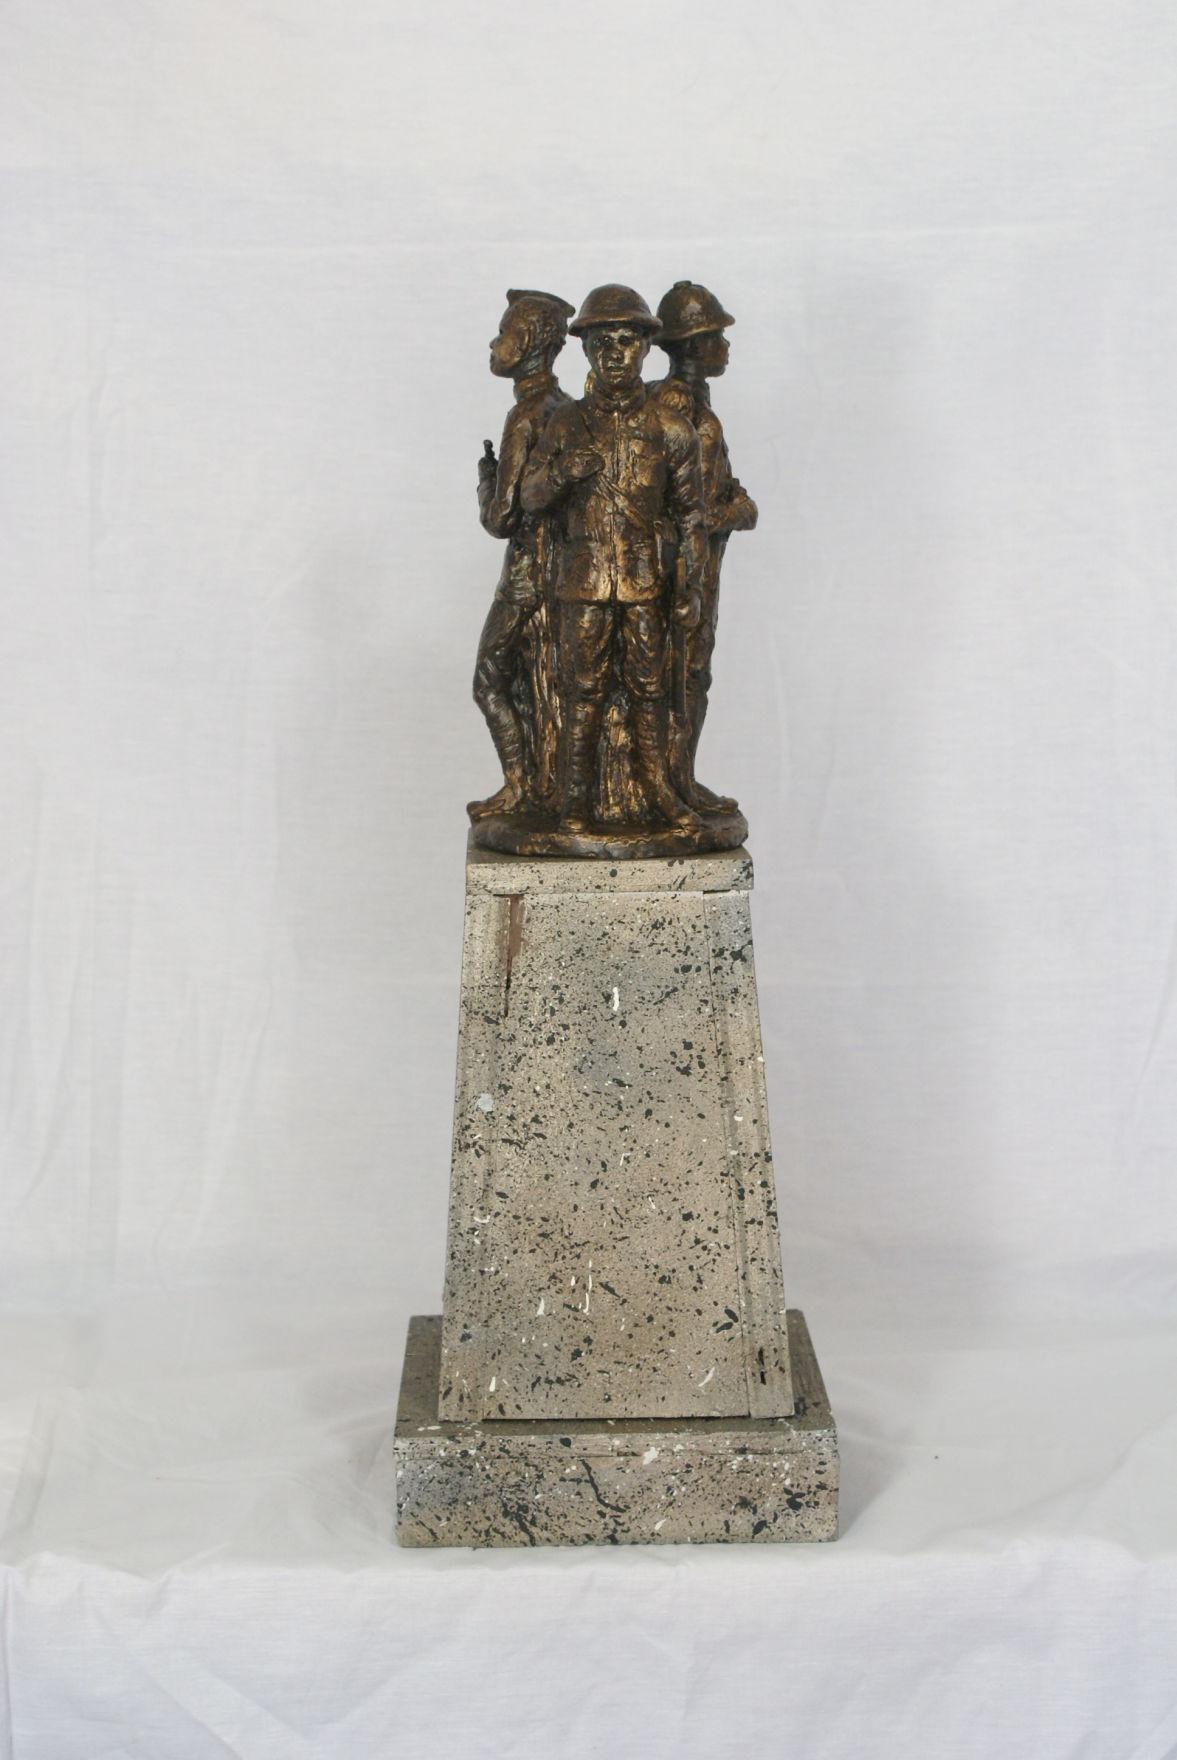 371st statue